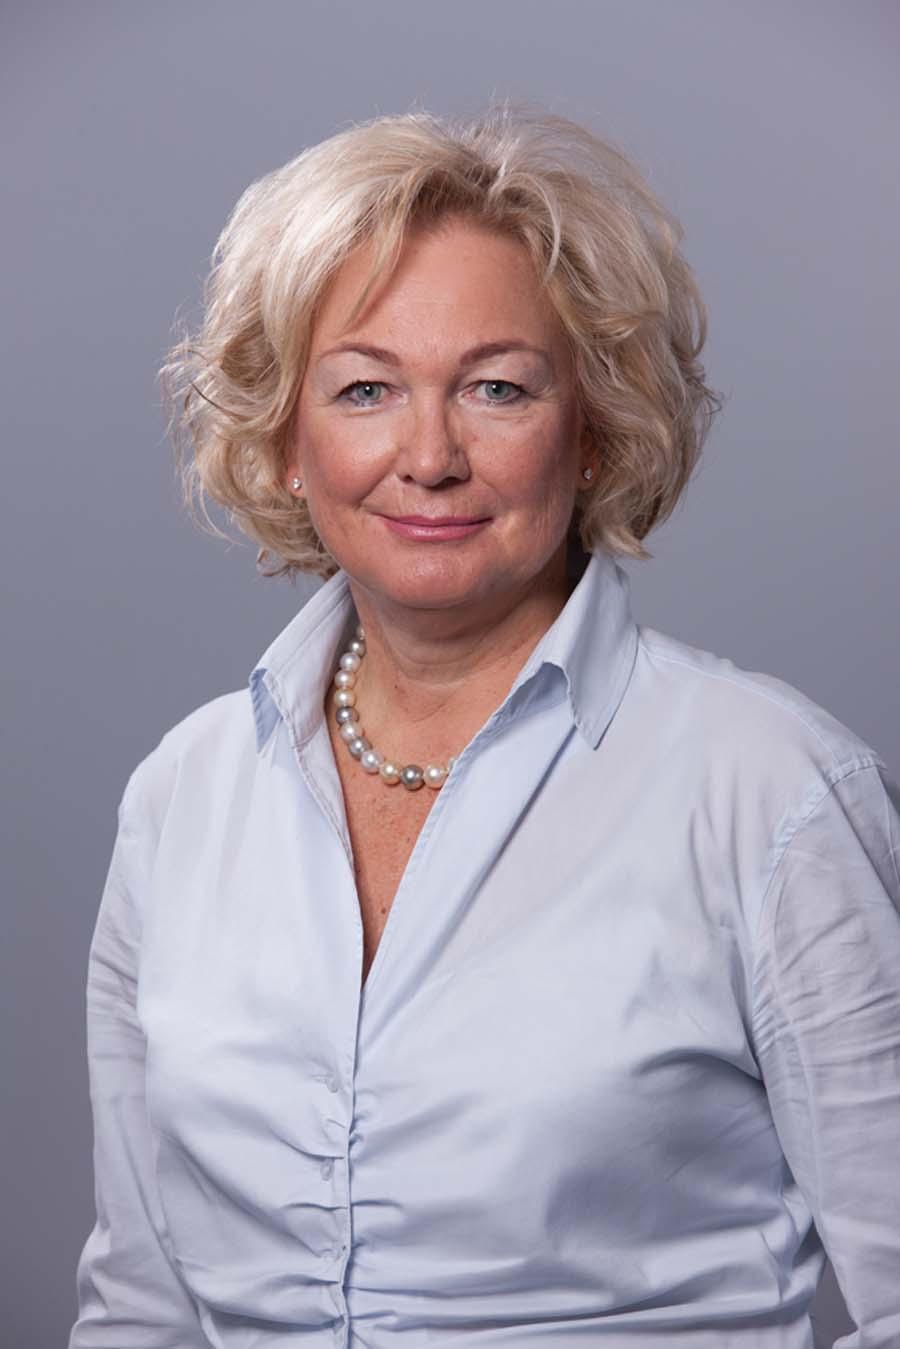 Dr. Helga Kammler-Baumann